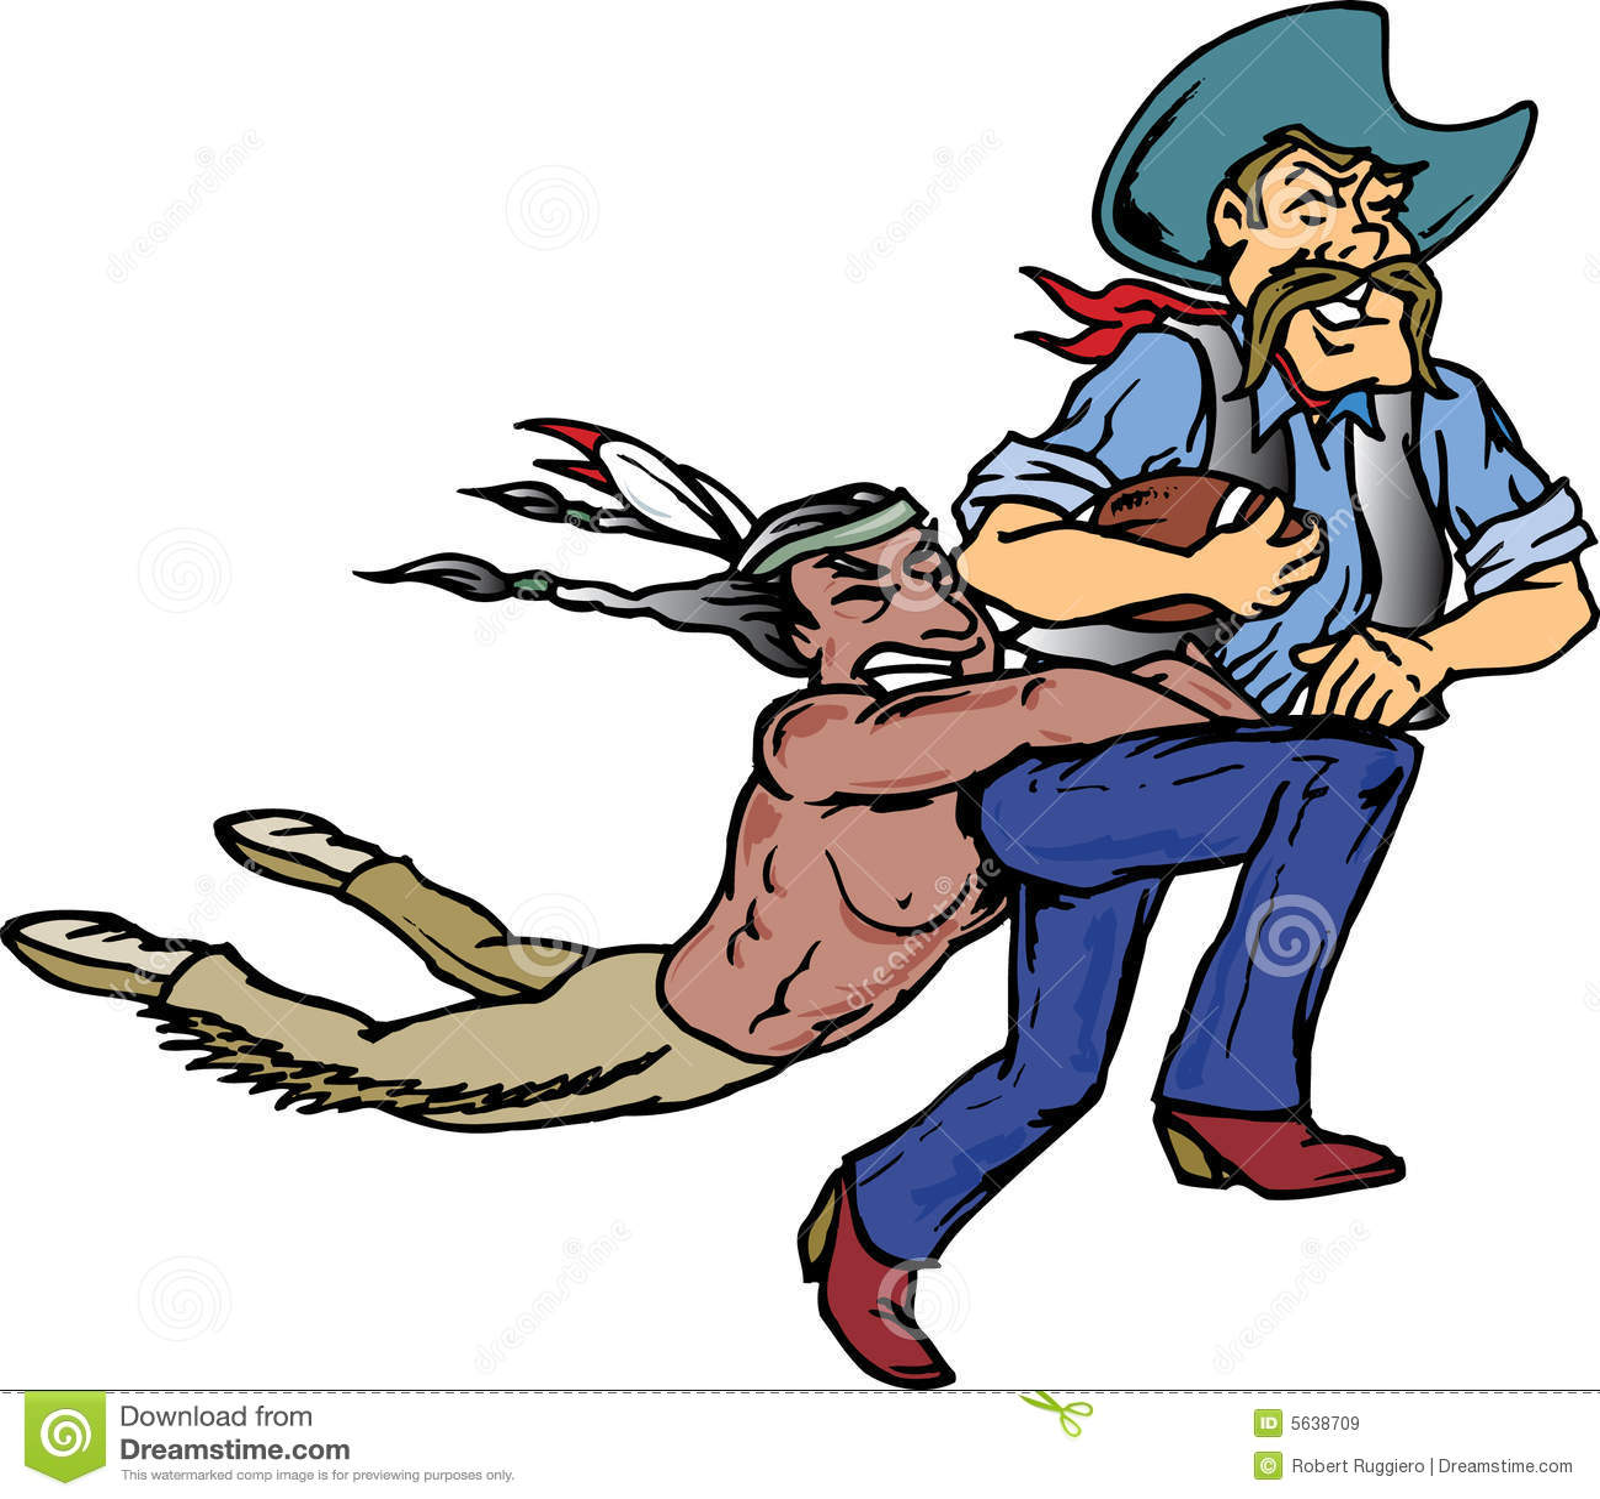 indio vaquero: